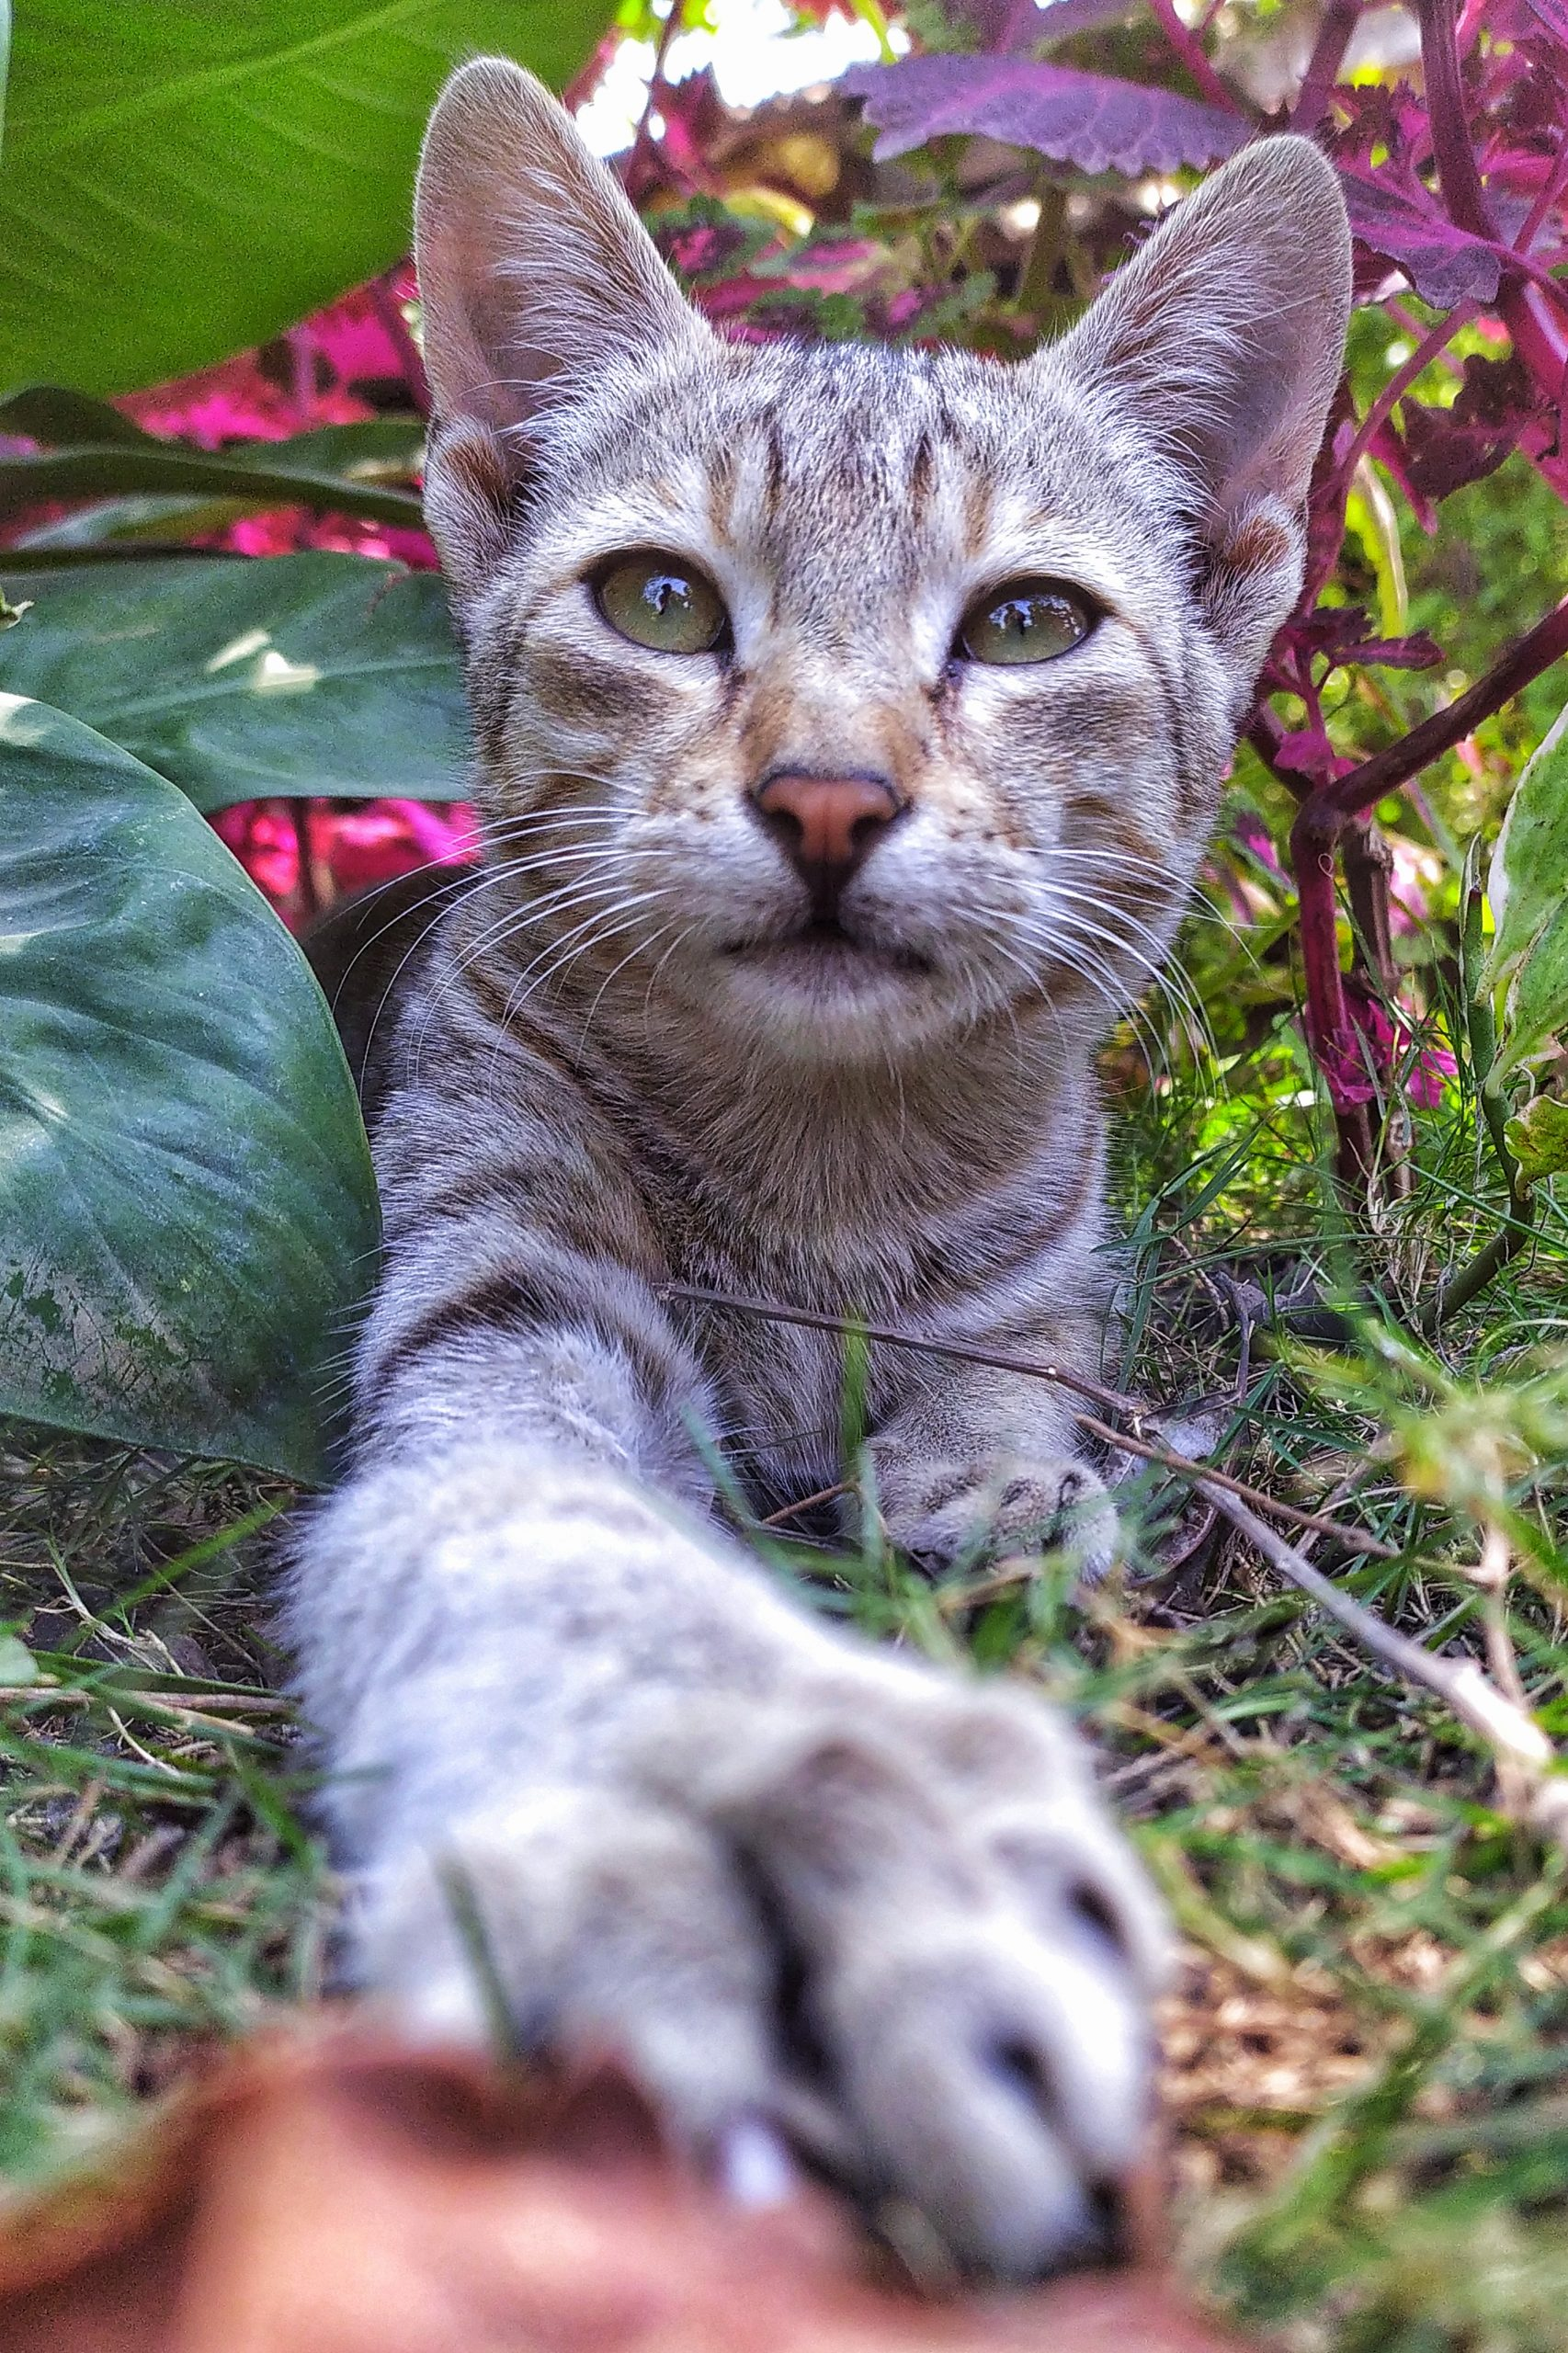 A cat in garden